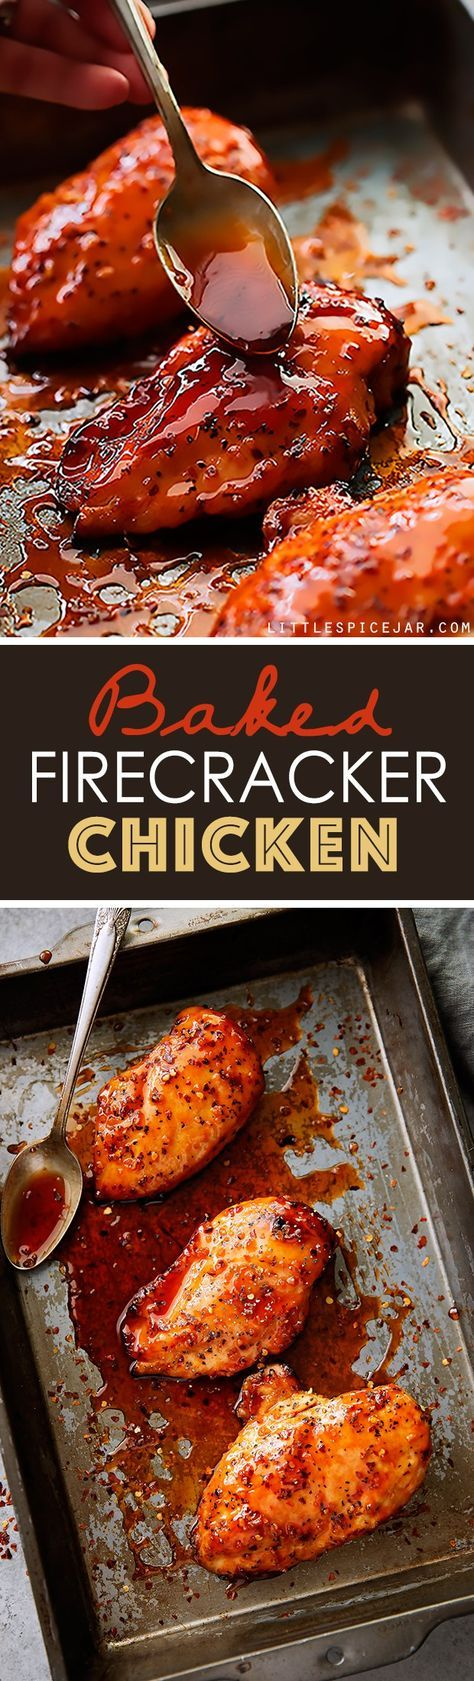 Baked Firecracker Chicken Recipe Little Spice Jar Recipe Recipes Spicy Recipes Chicken Recipes